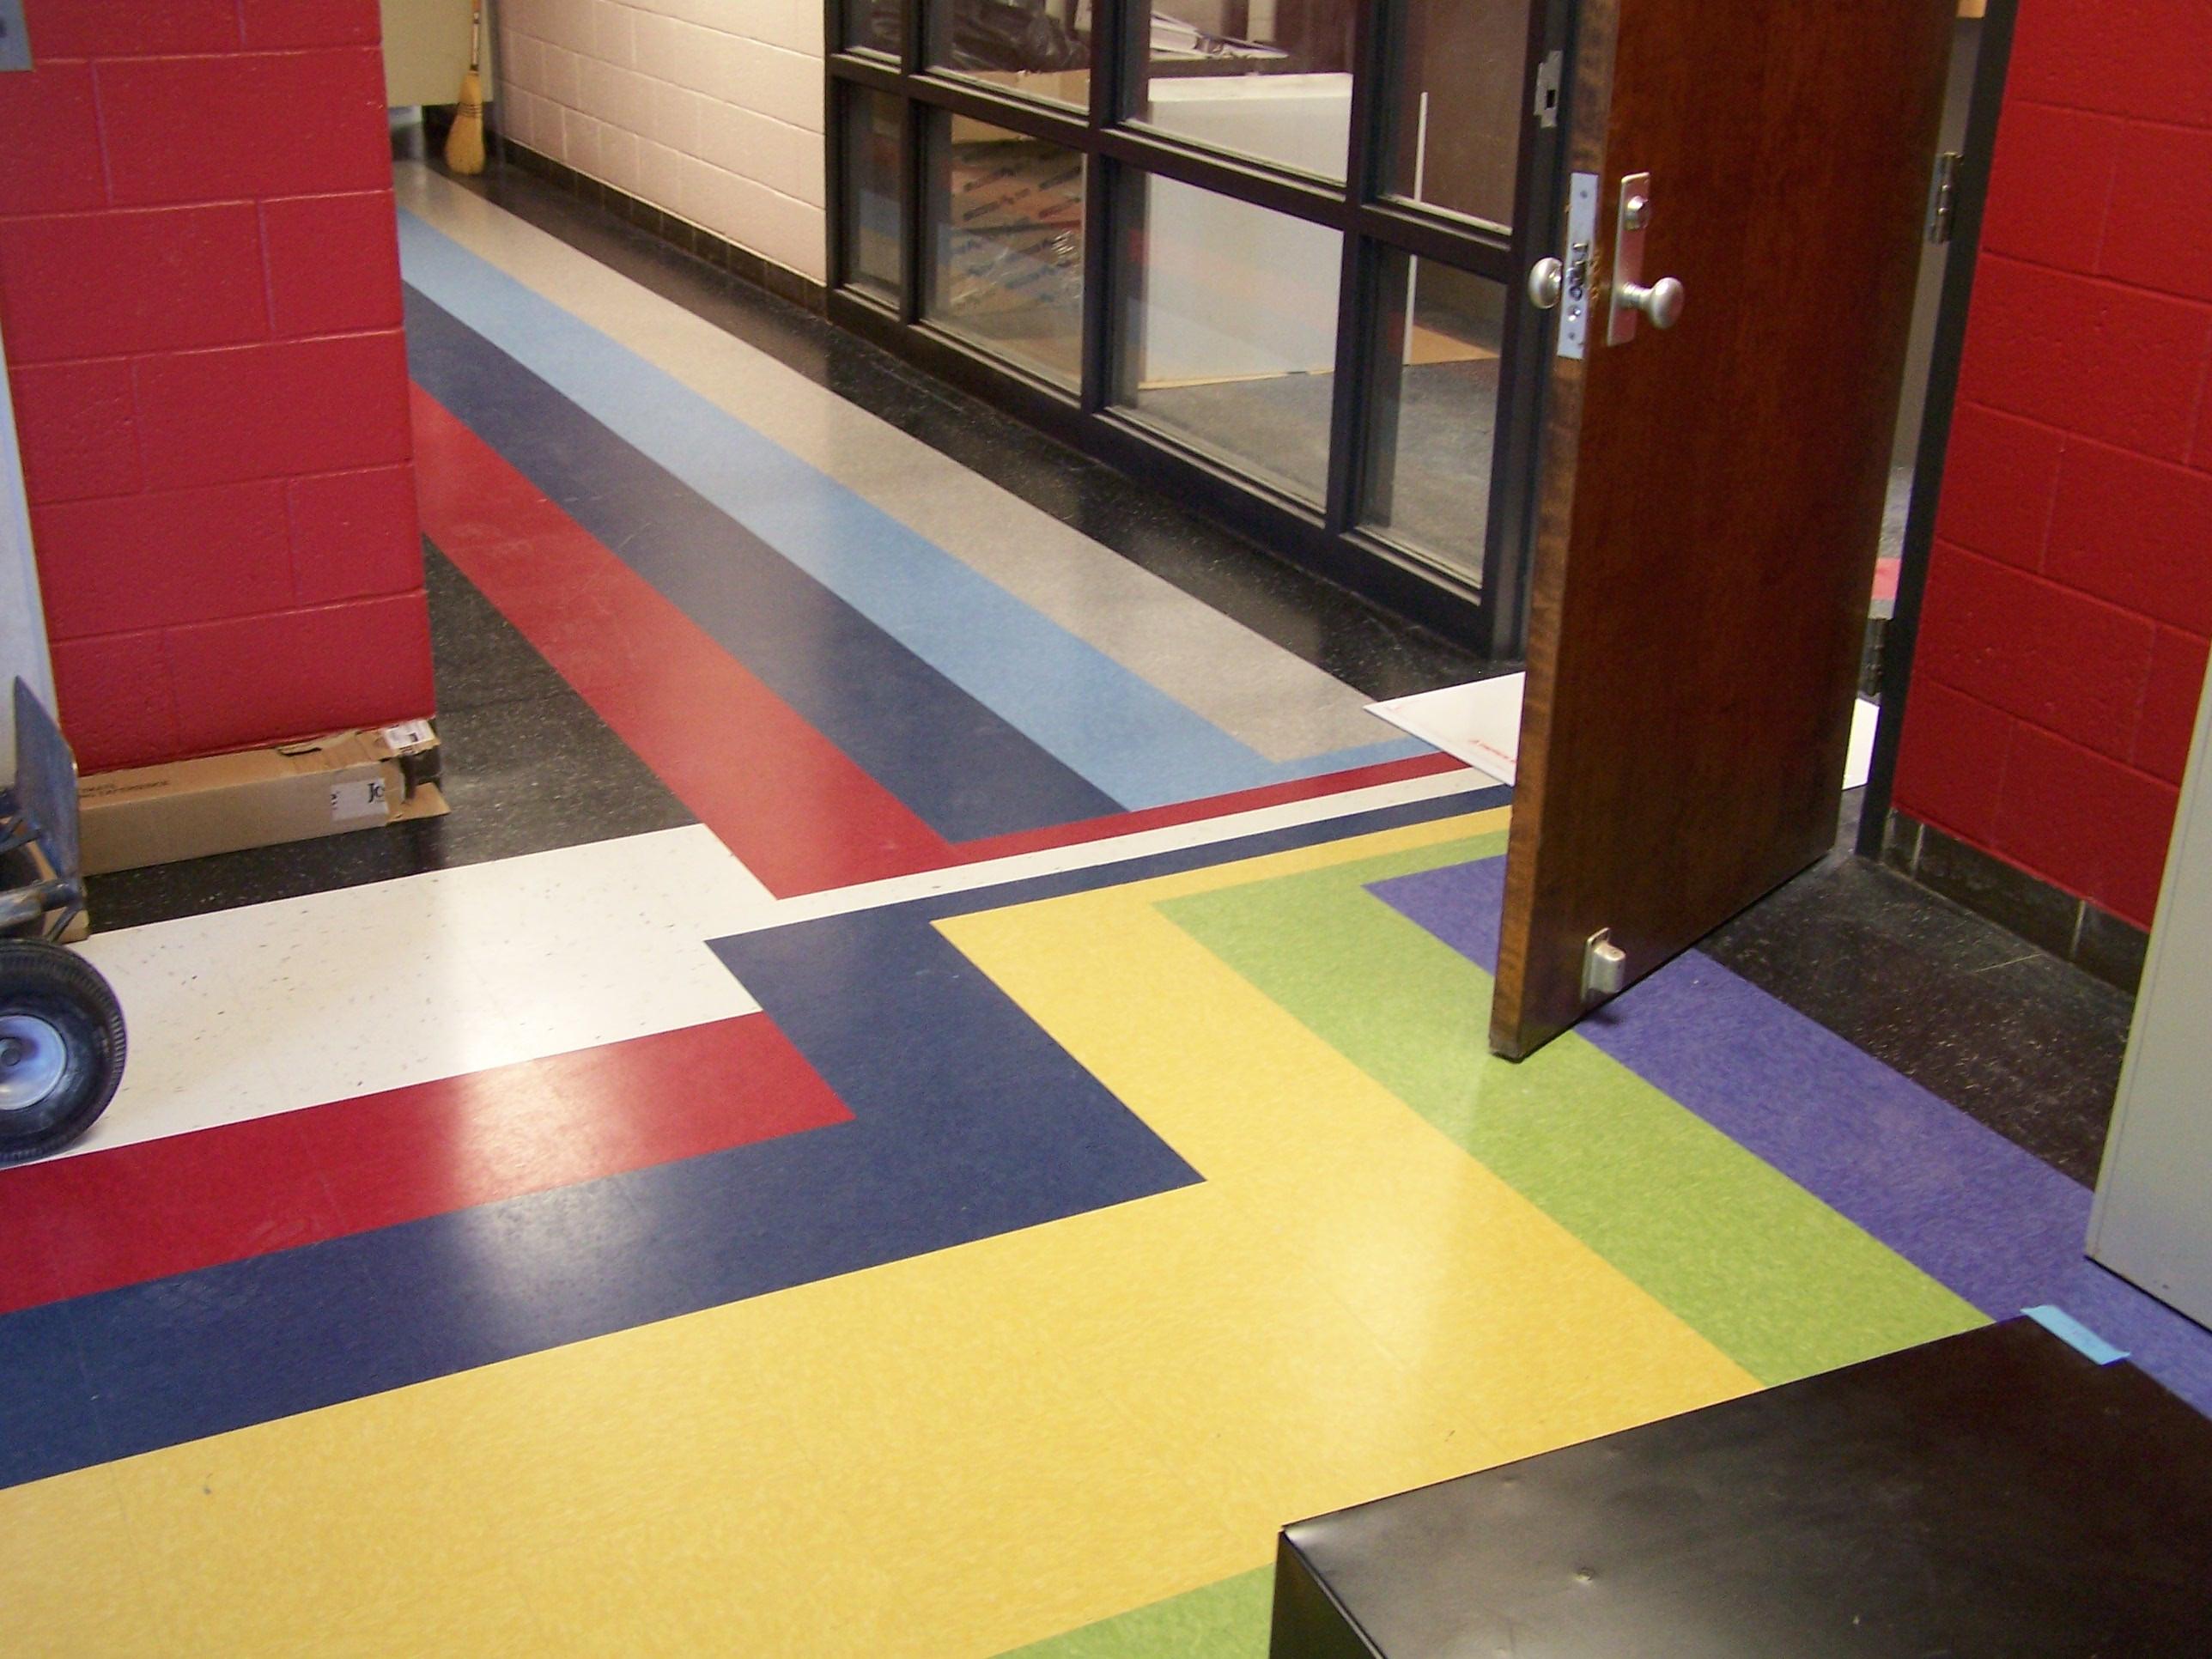 hardwood floor refinishing in livonia mi of pyramid awards wcaonline within sharmrock allen school